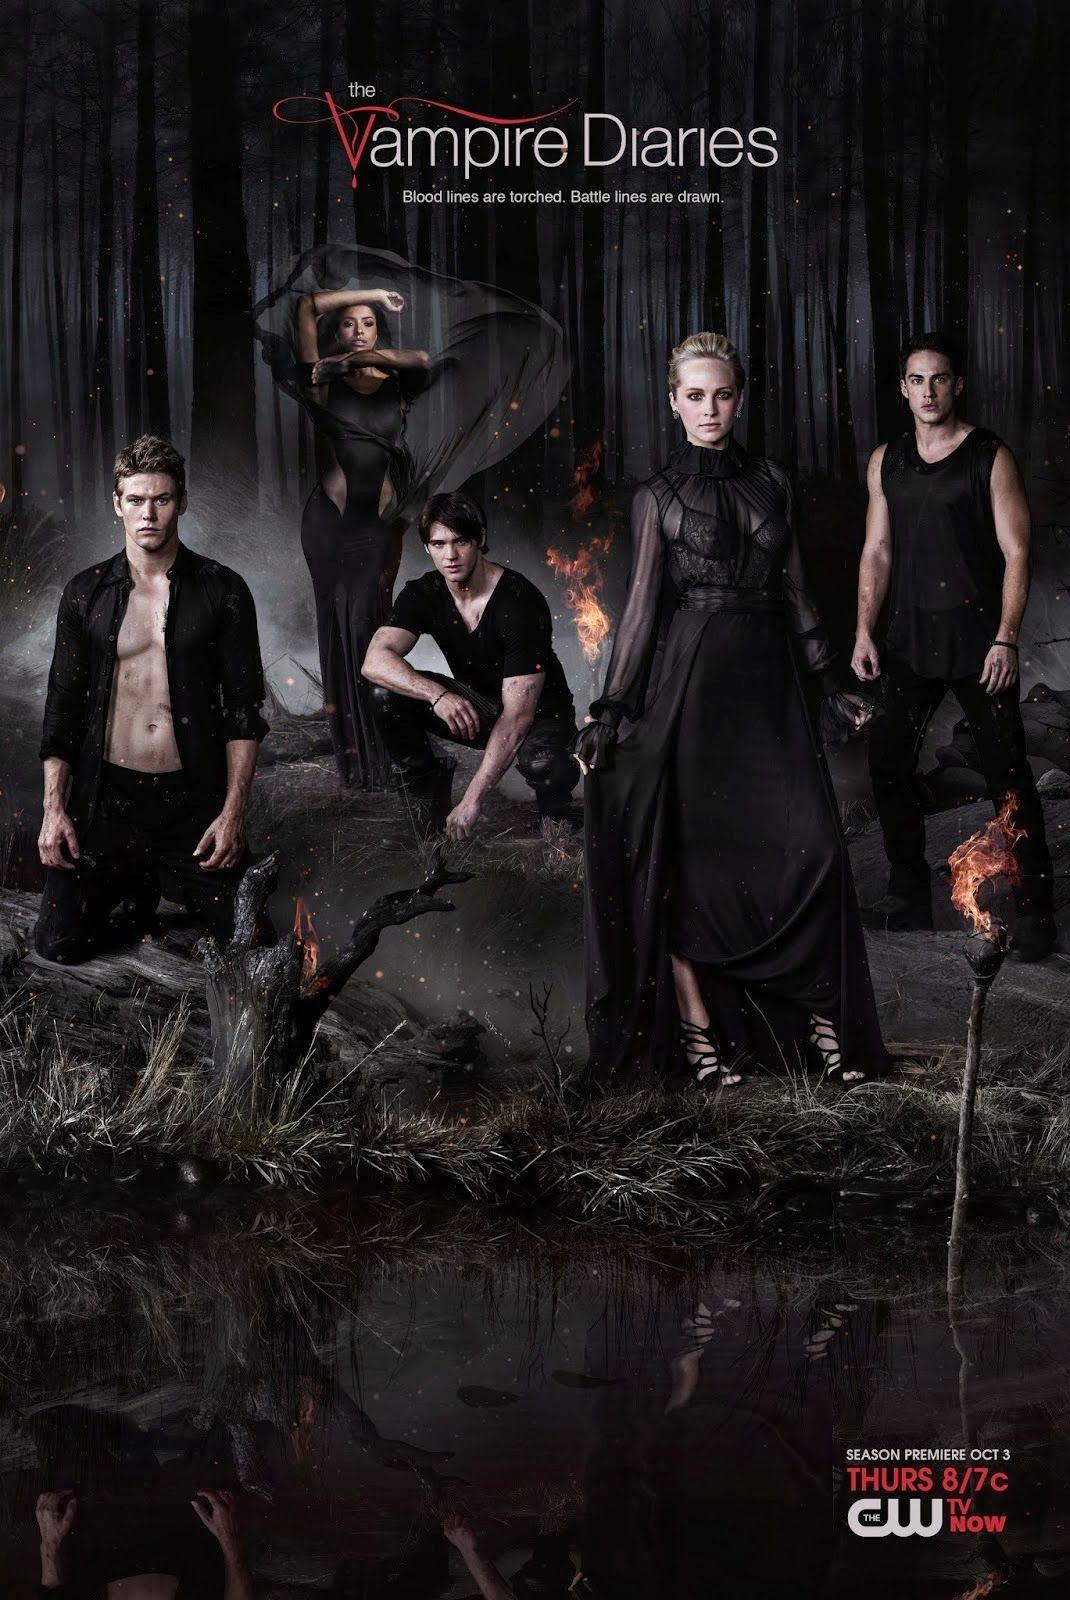 The Vampire Diaries Season 5 Vampire Diaries Vampire Diaries Season Vampire